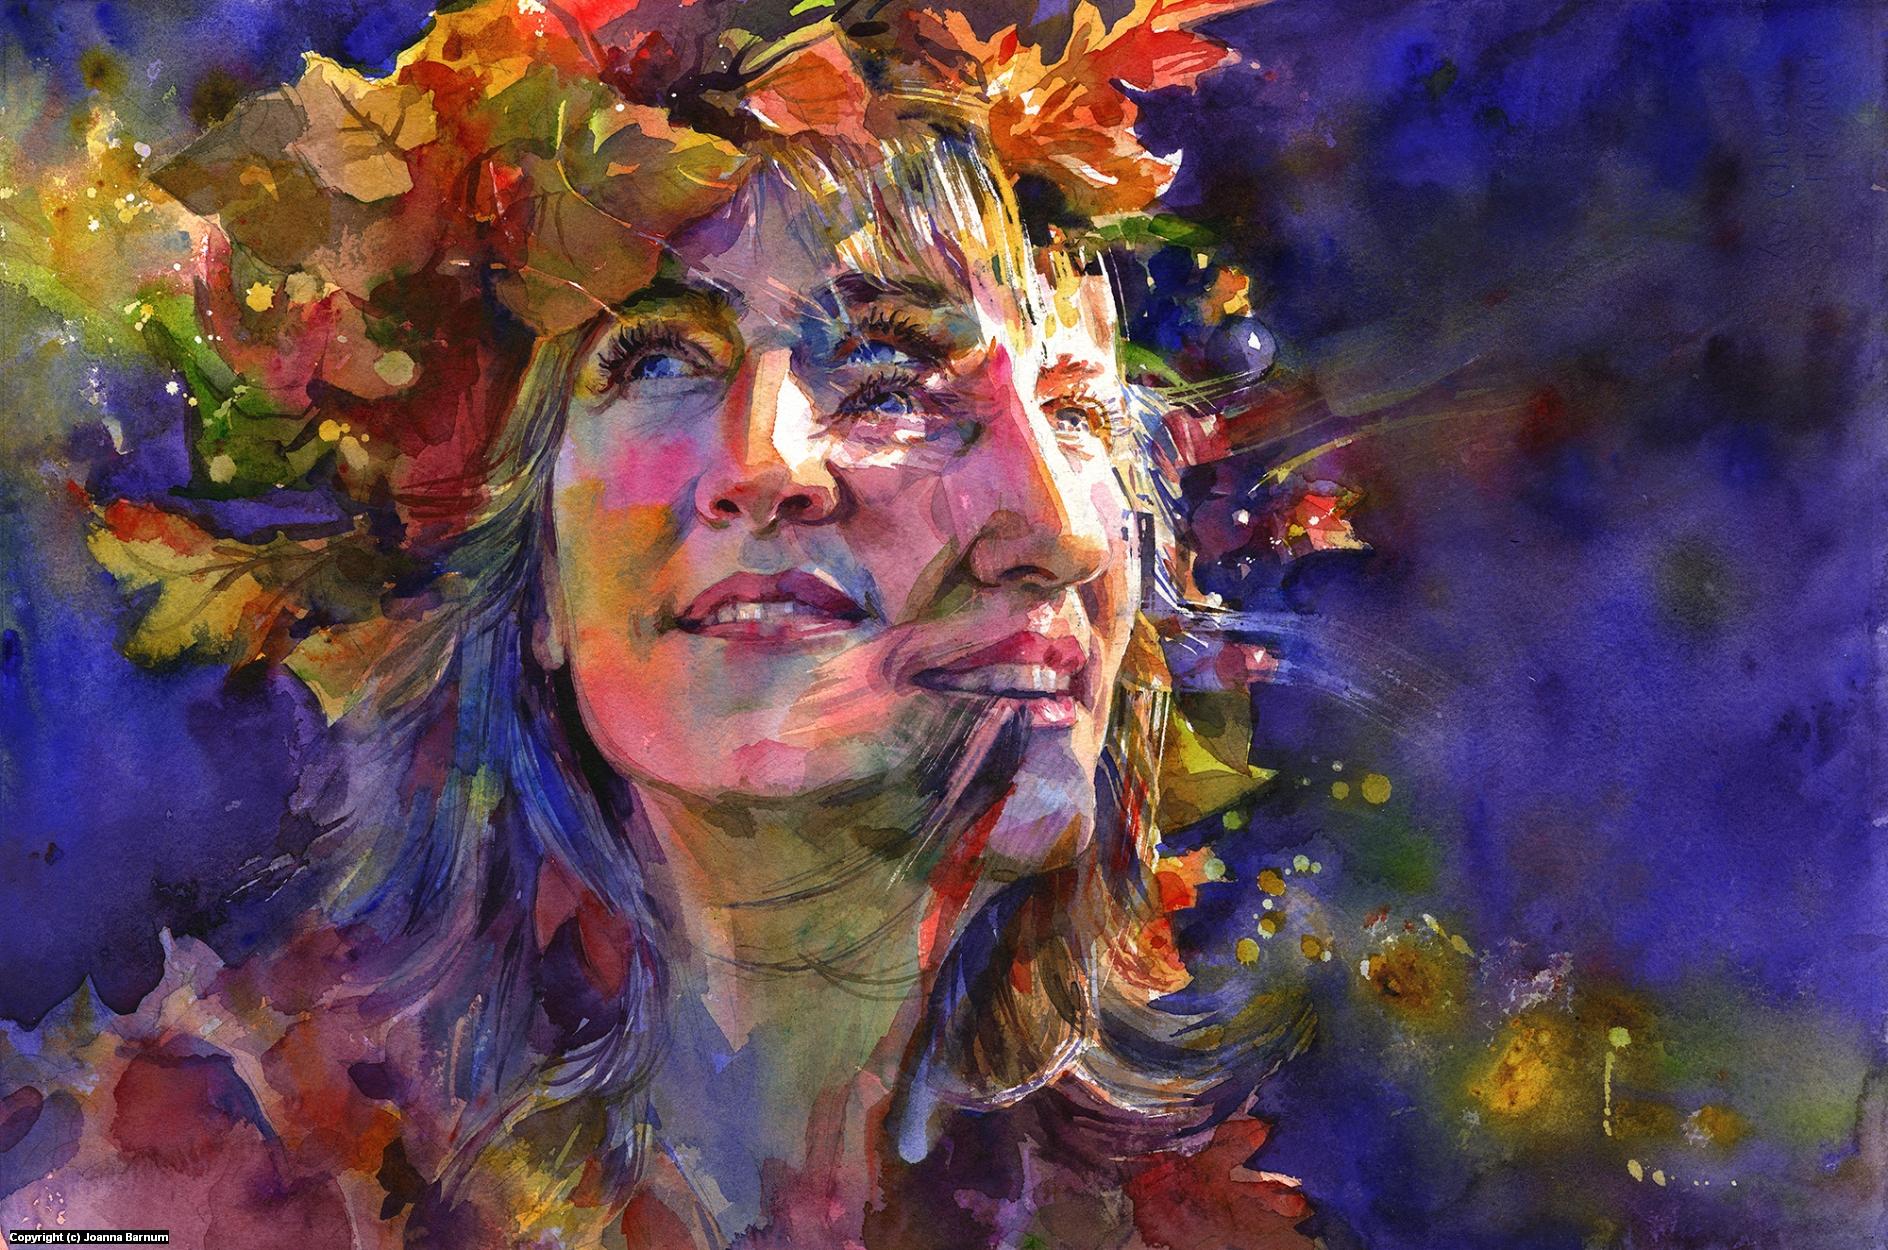 Aurelia Artwork by Joanna Barnum